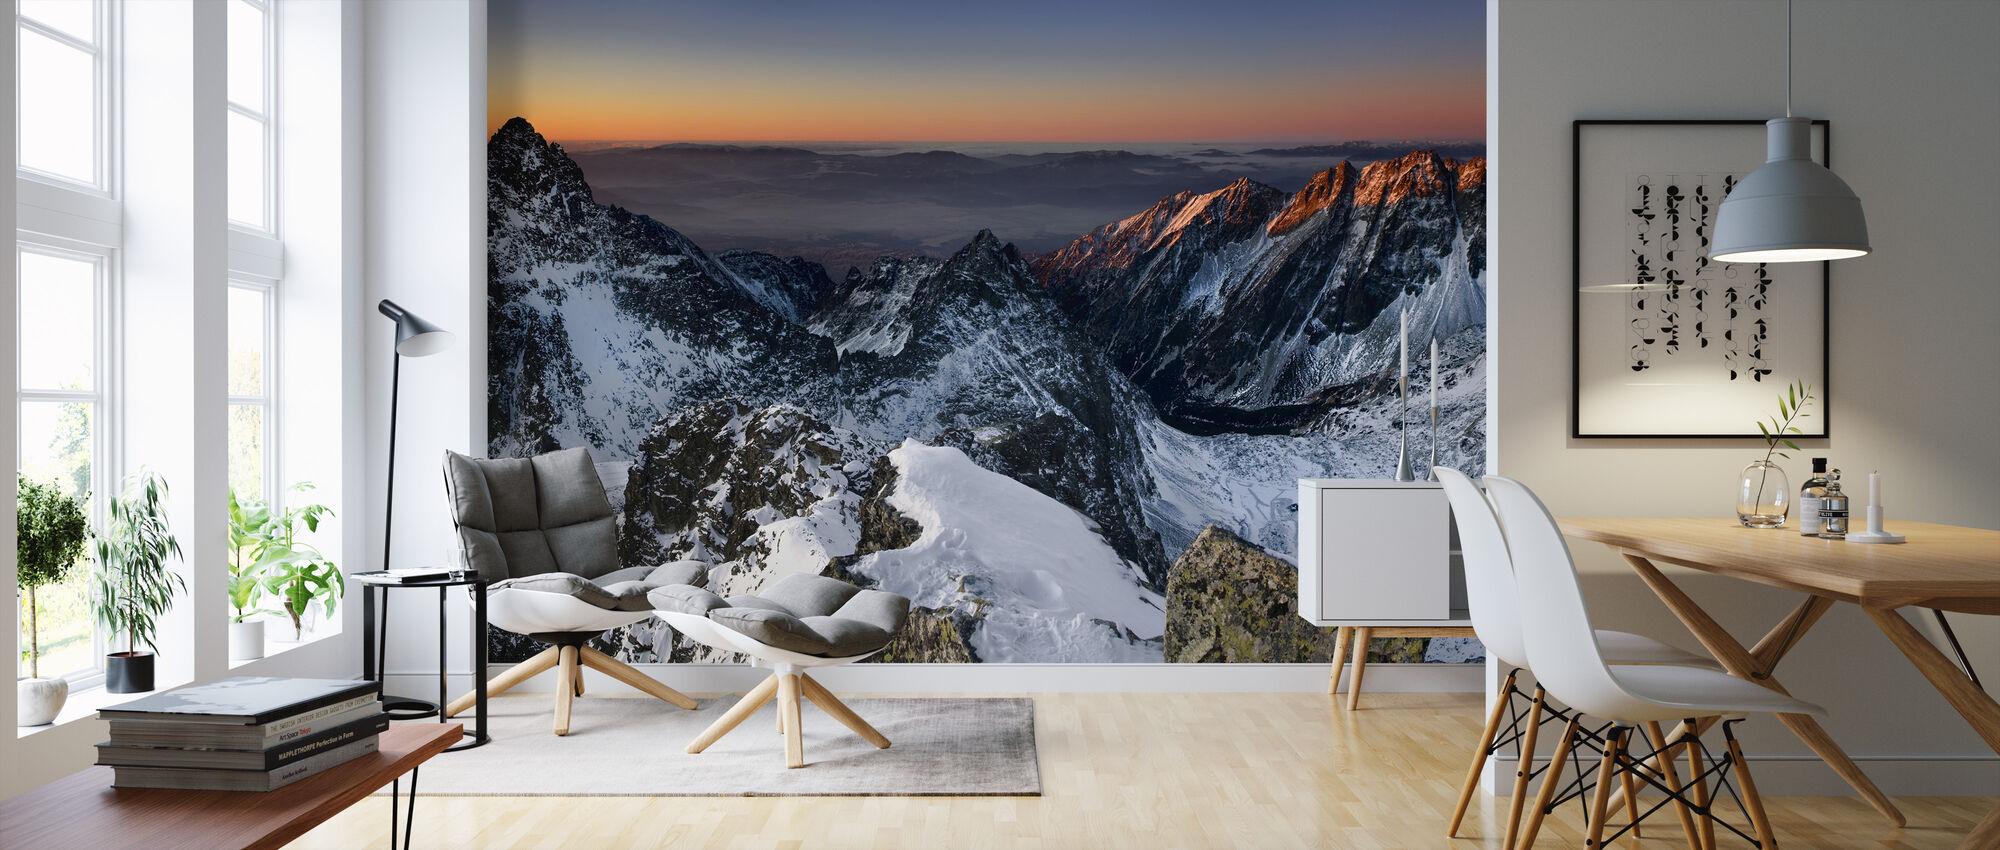 Sun Rise in High Tatras - Wallpaper - Living Room